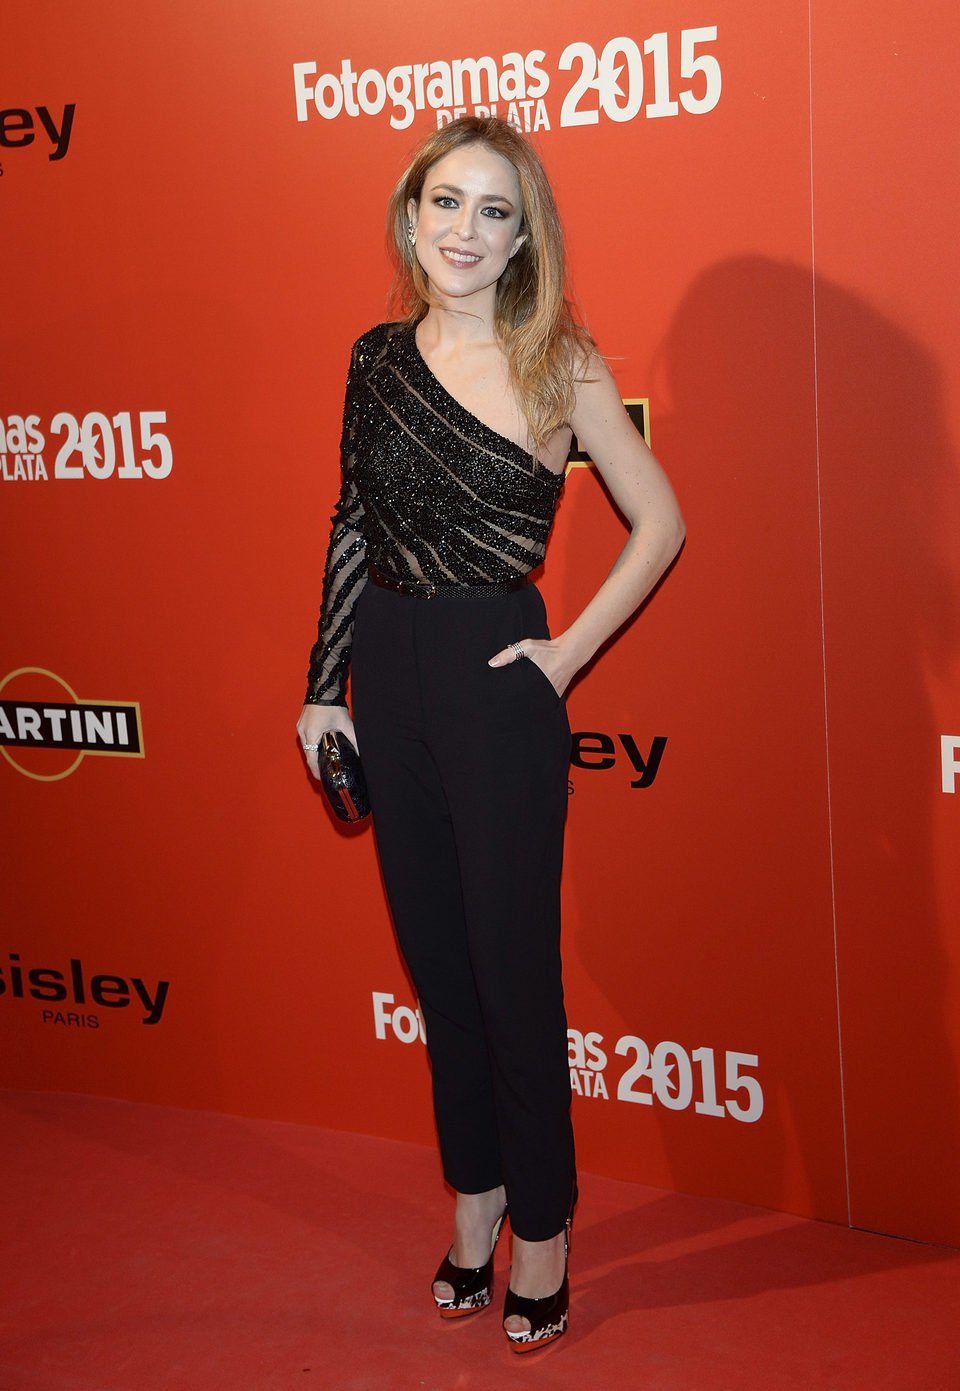 Silvia Abascal en la alfombra roja de los Fotogramas de Plata 2015